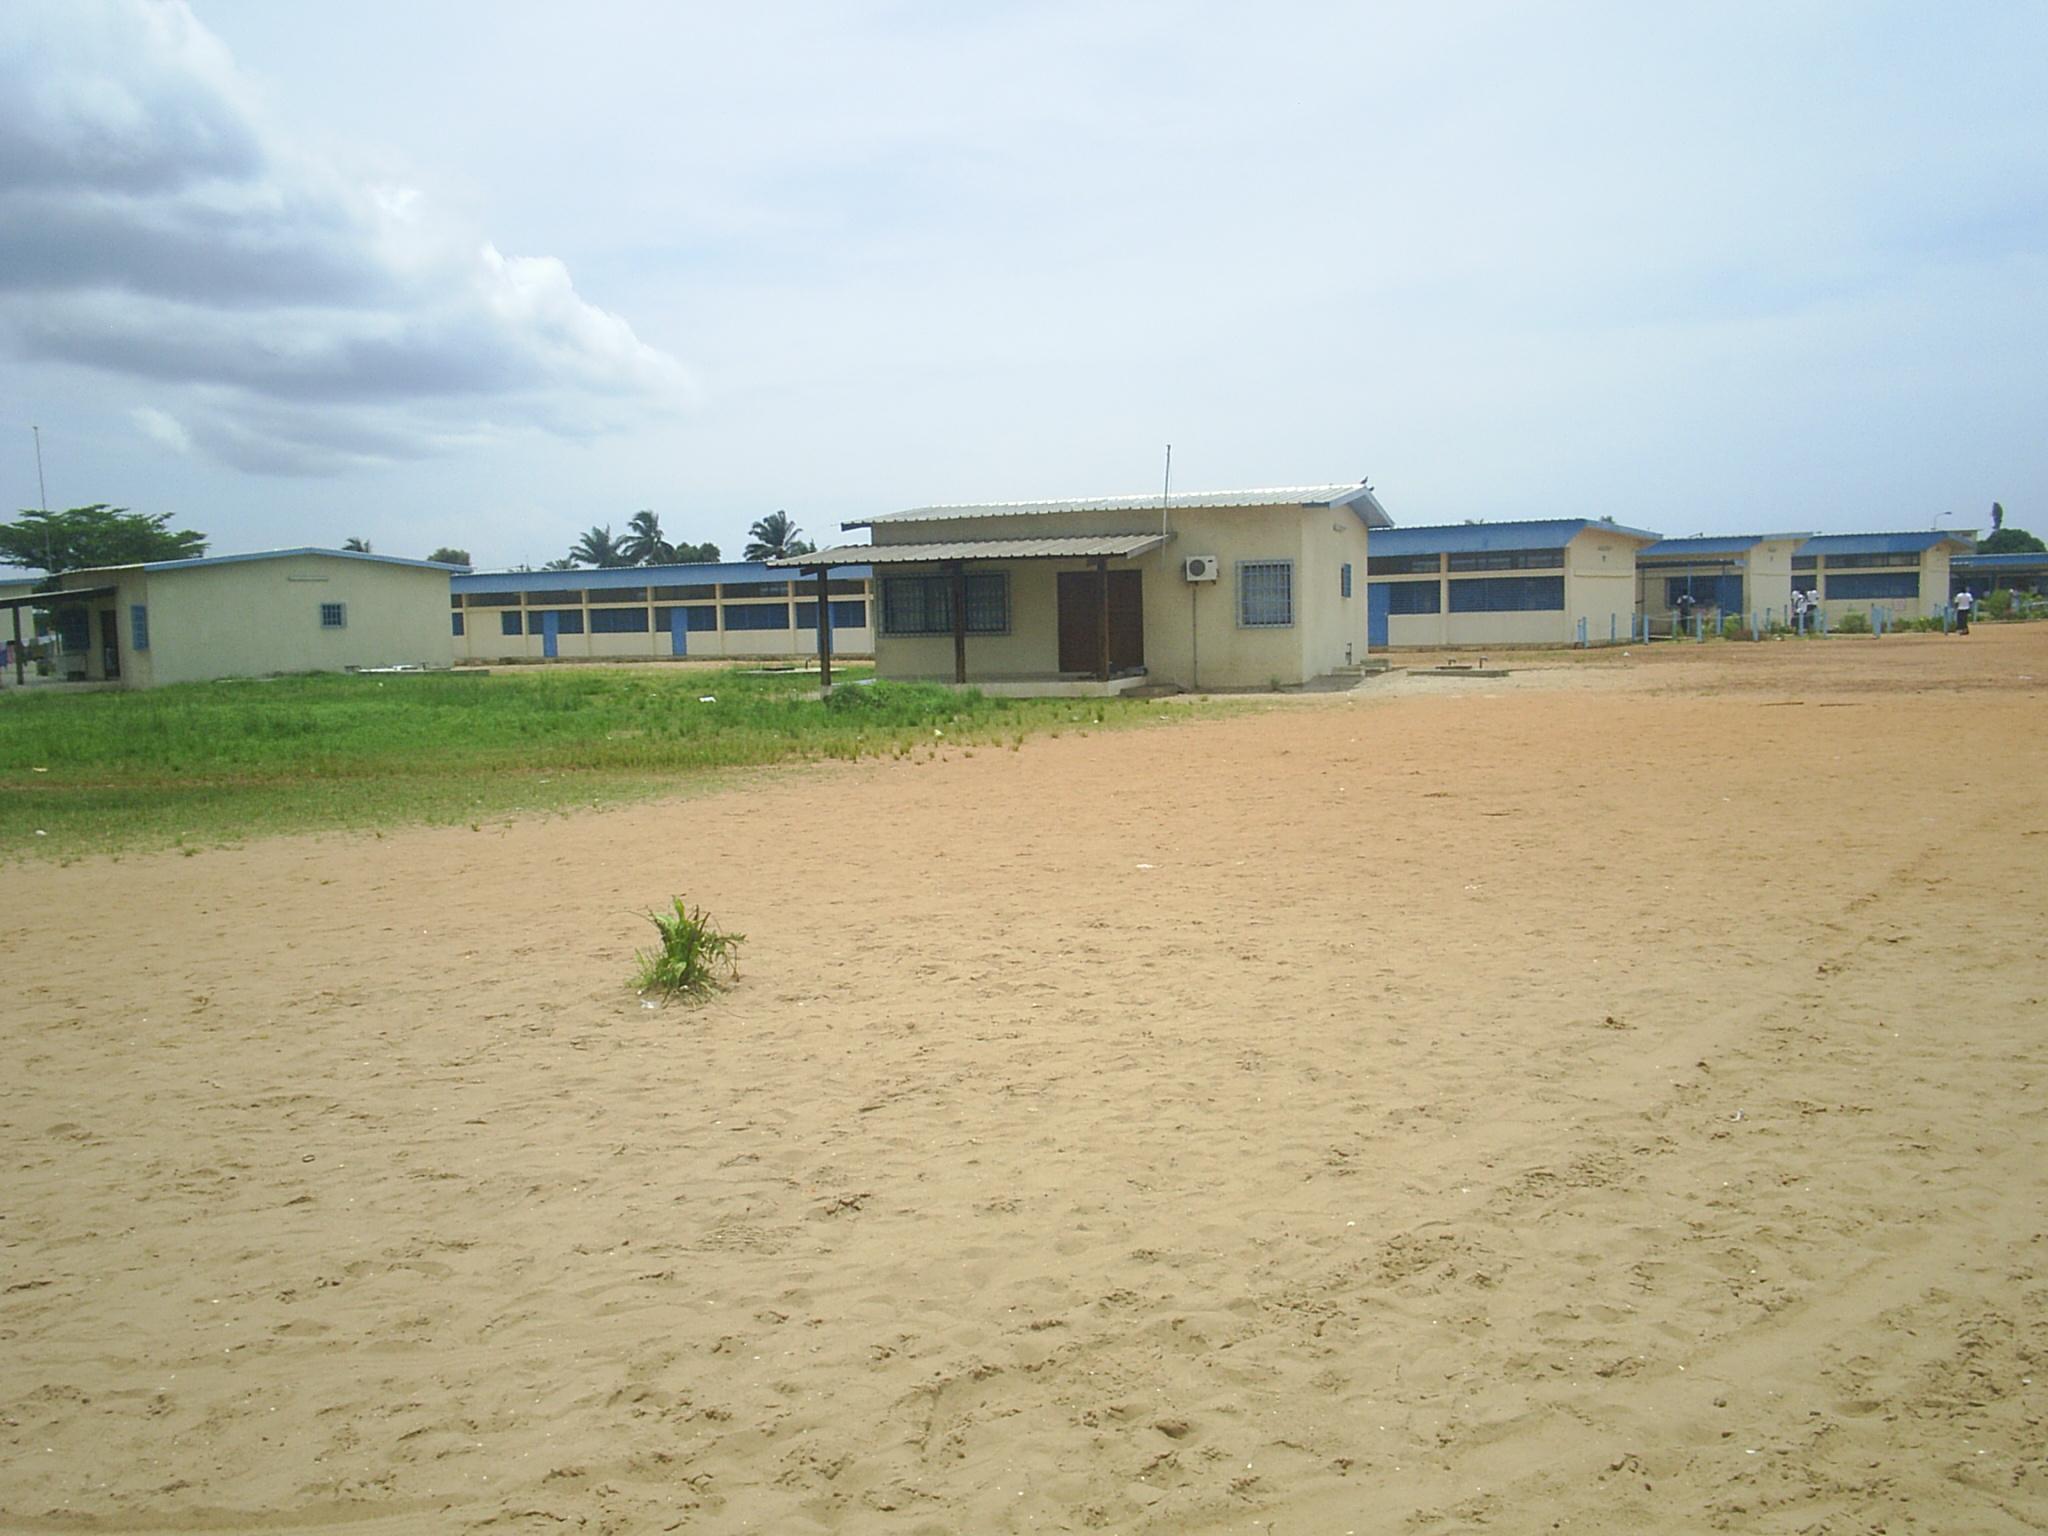 Computers in schools in Gabon /static/Gabon/S4010149.JPG